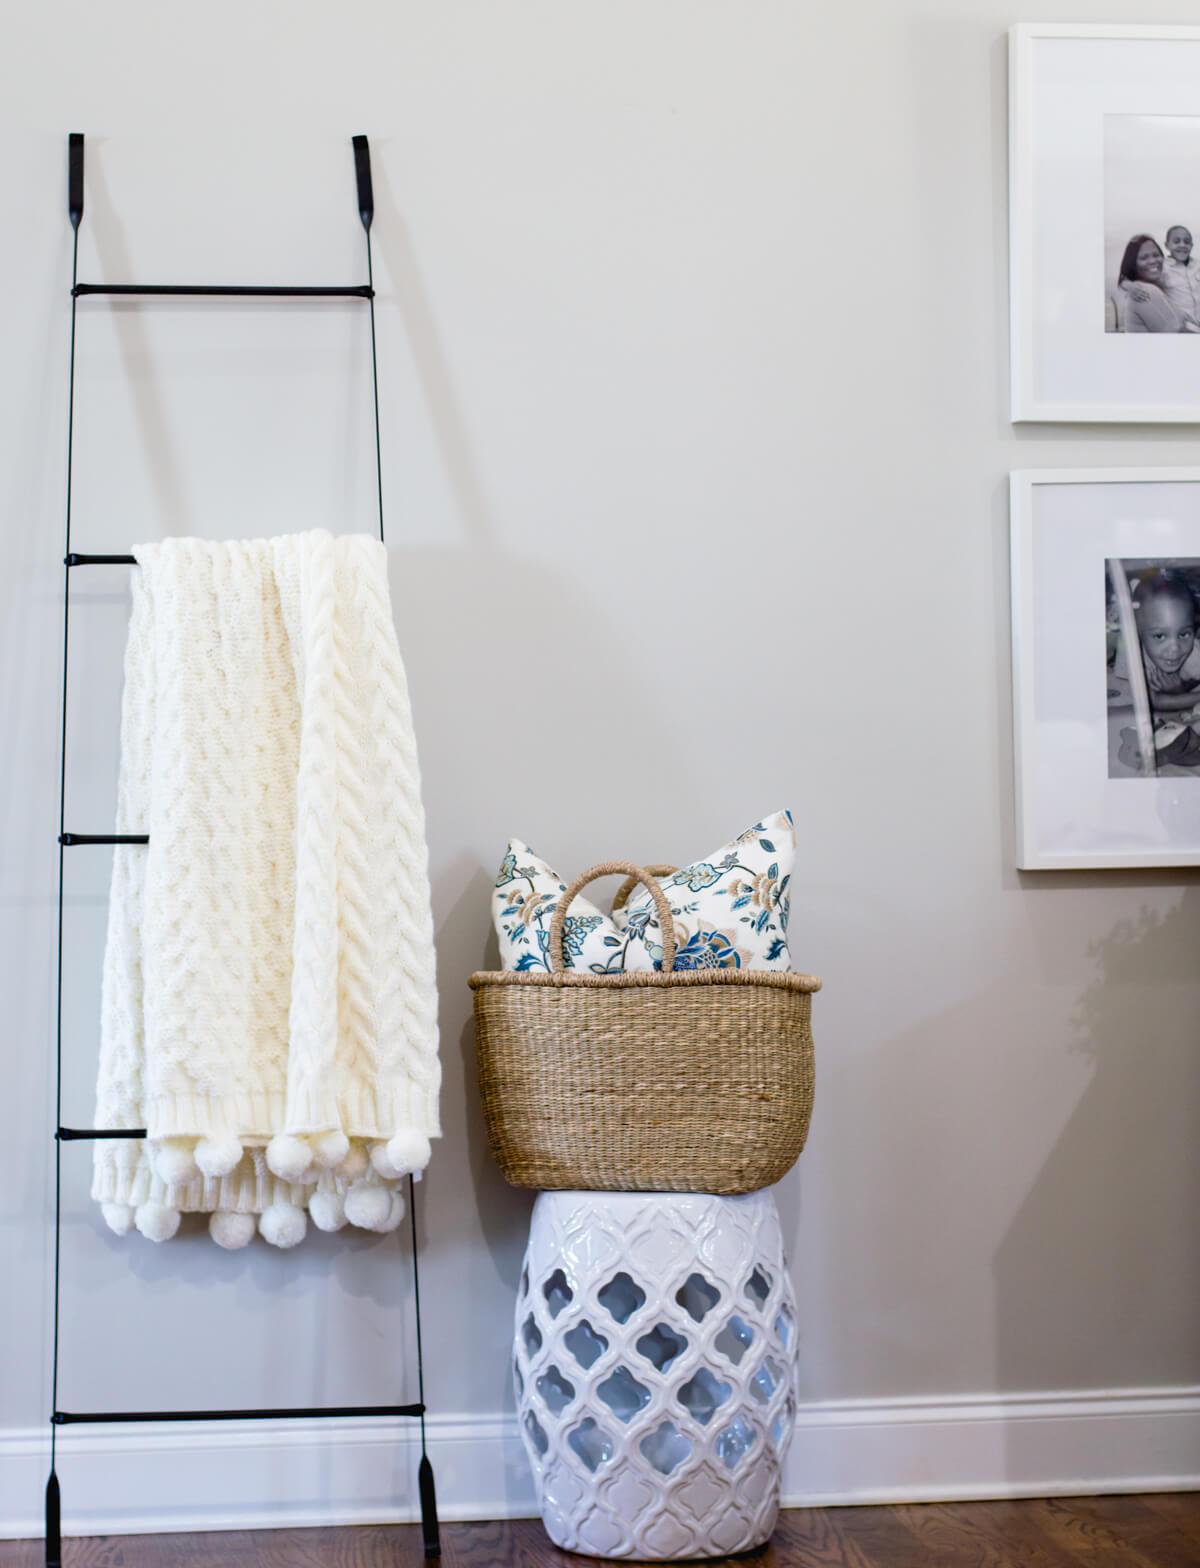 Magnolia Market Blanket Ladder The Home I Create